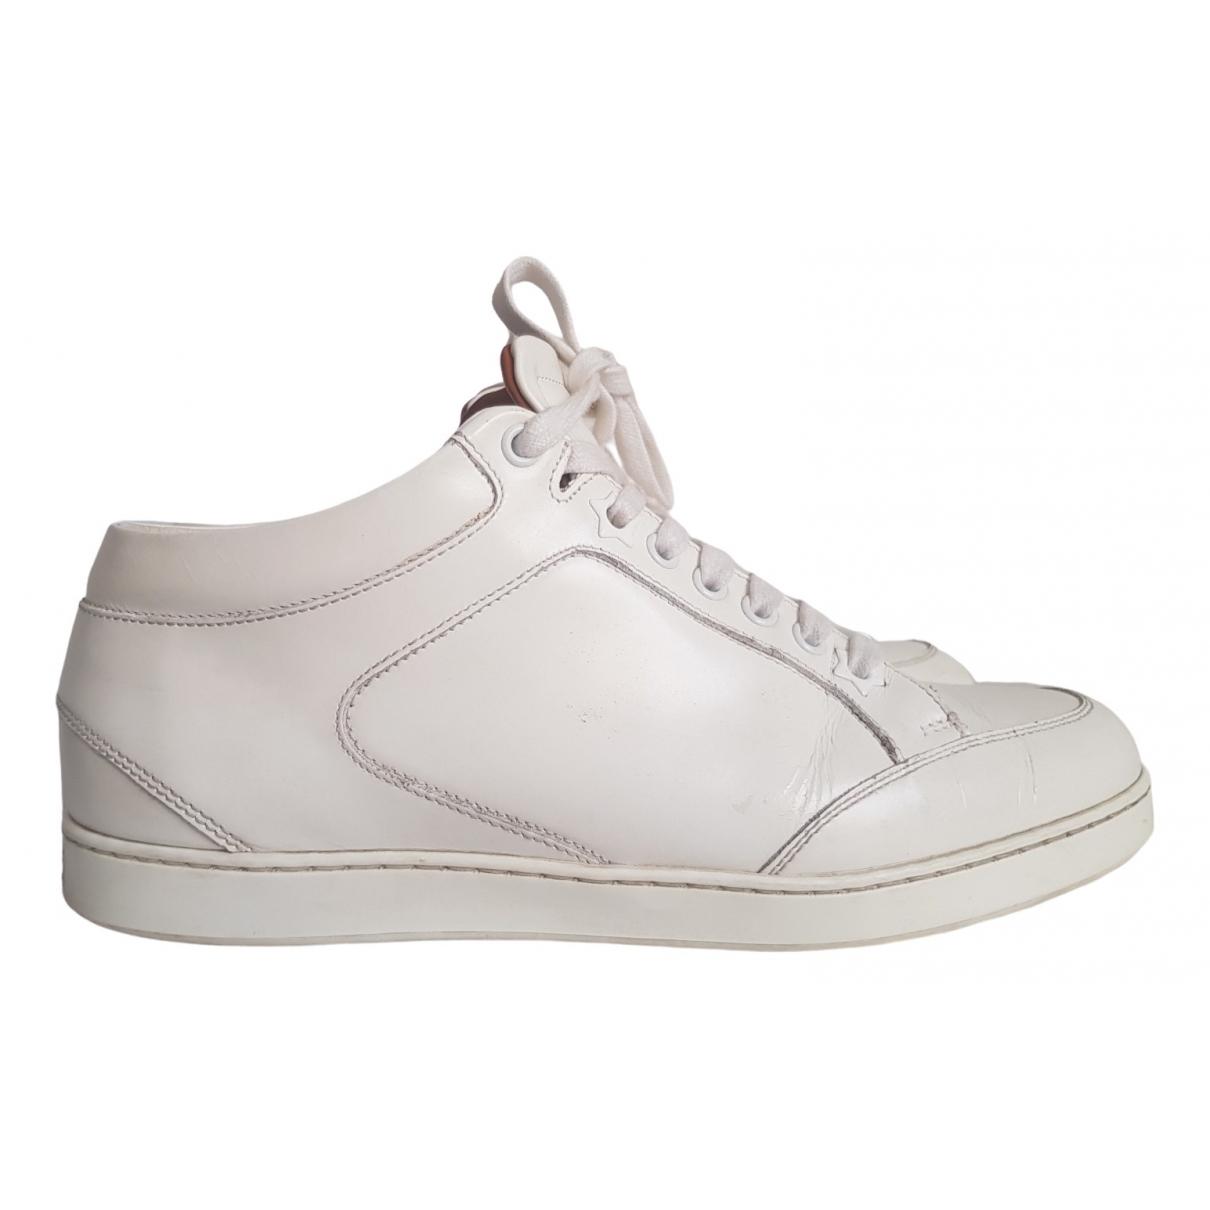 Jimmy Choo - Baskets   pour femme en cuir - blanc